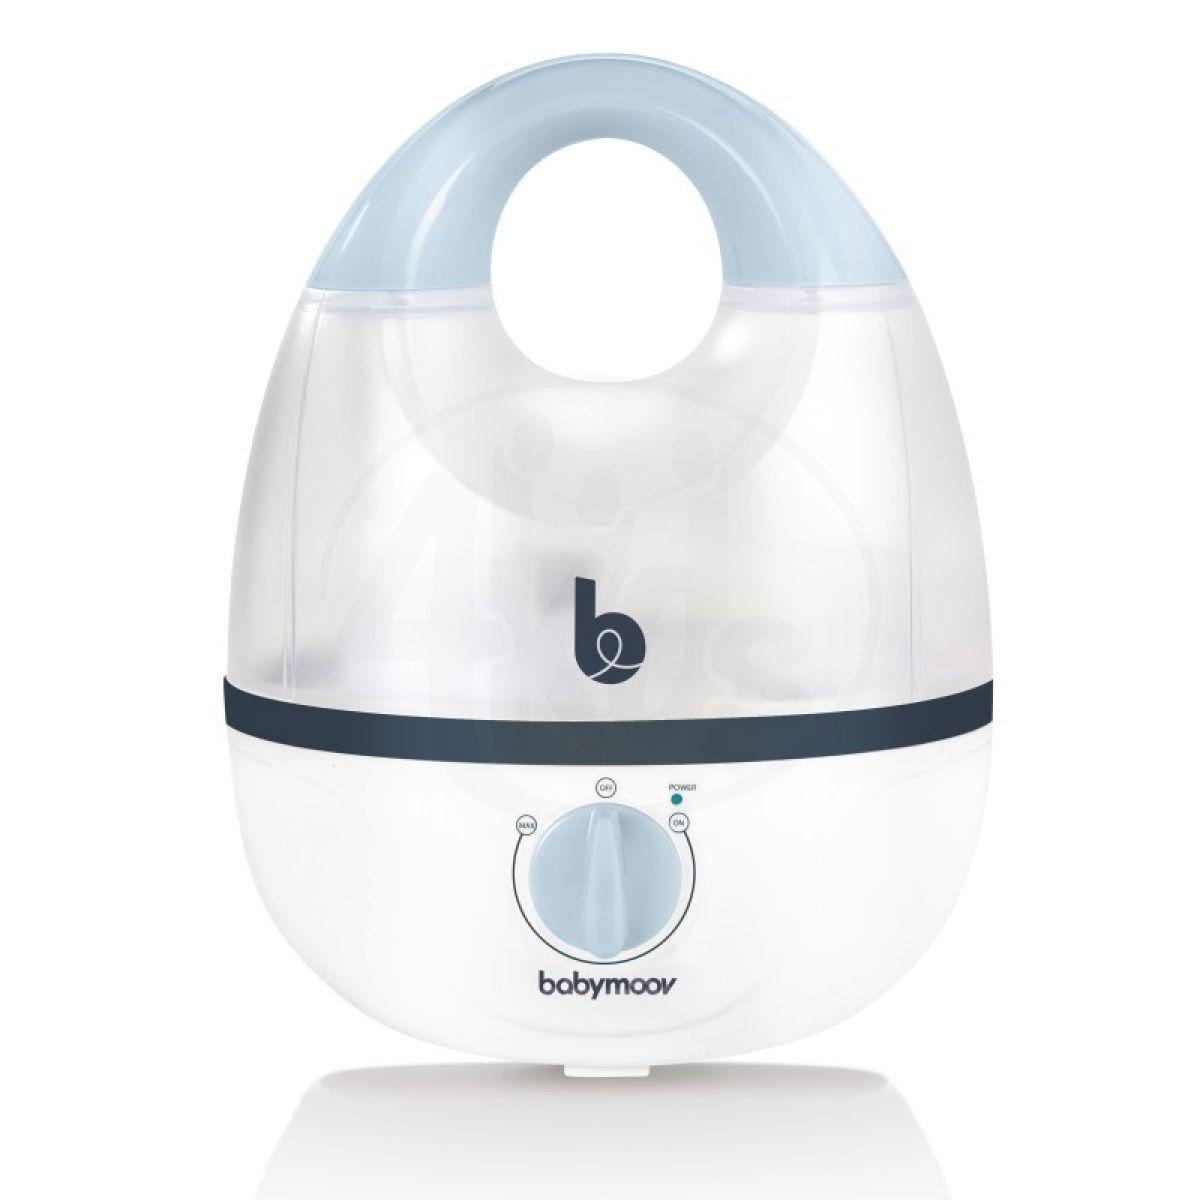 Babymoov Hygro zvlhčovač vzduchu